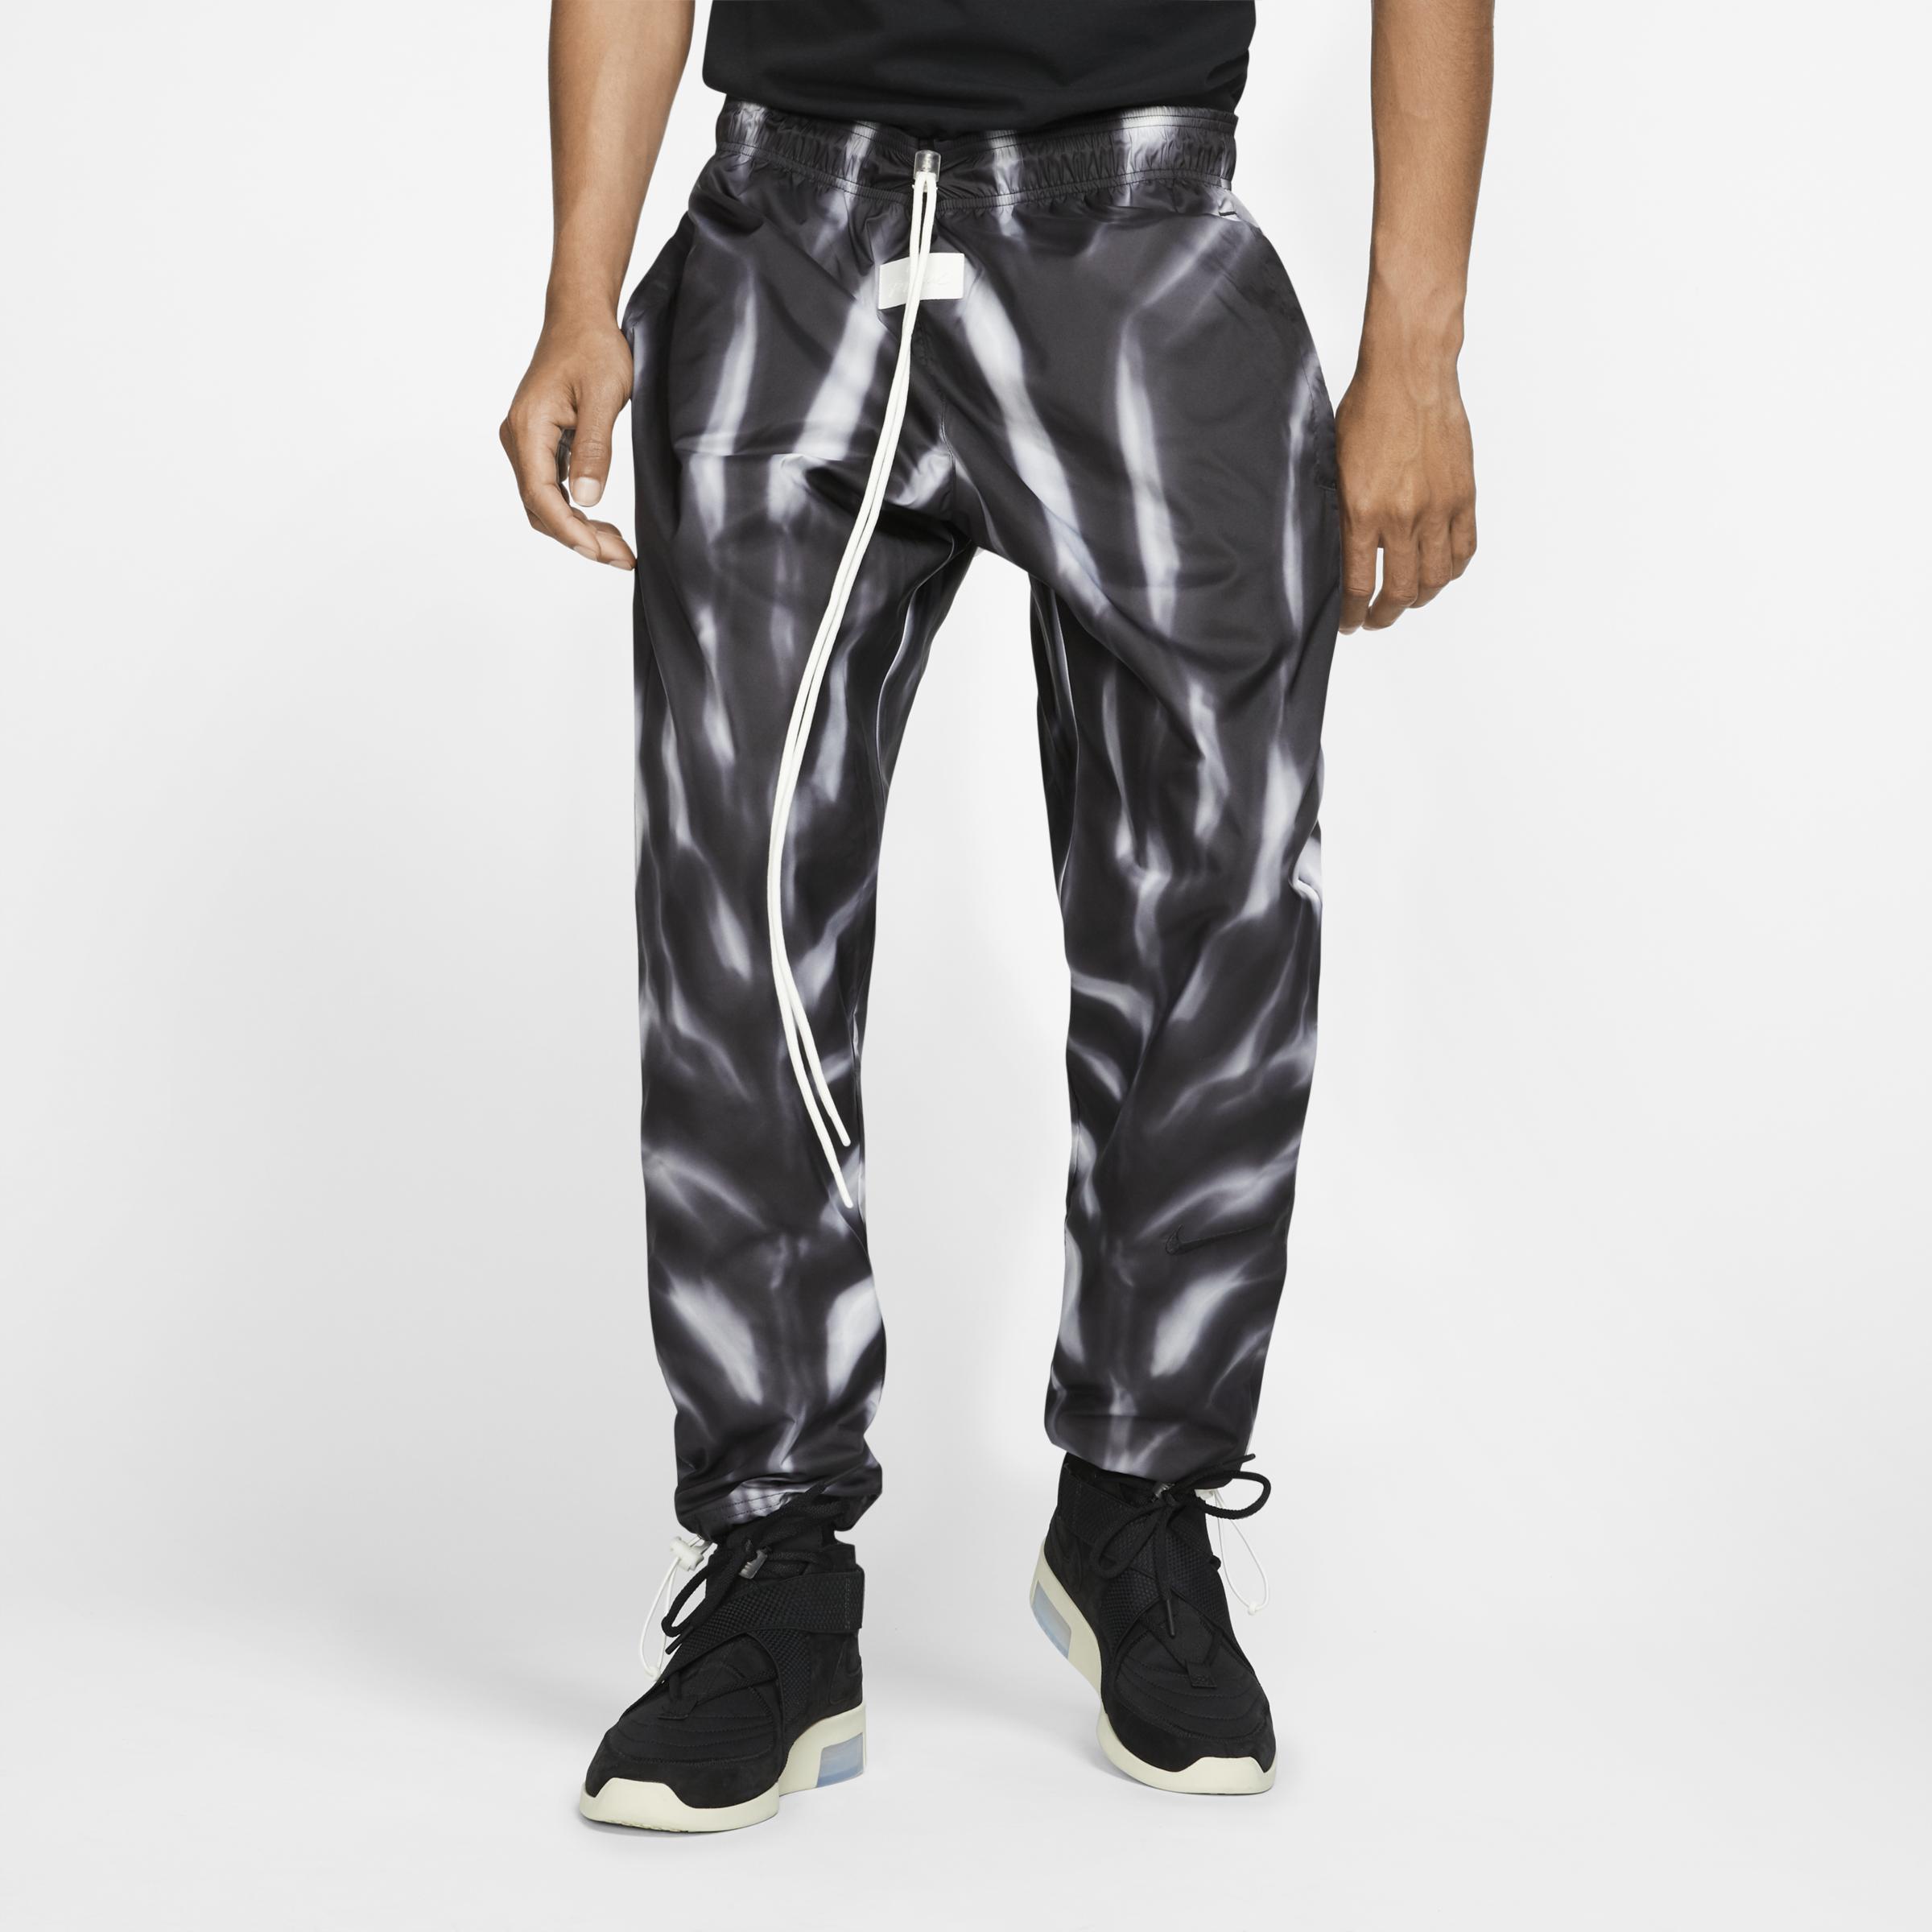 pantalon nike fear of god